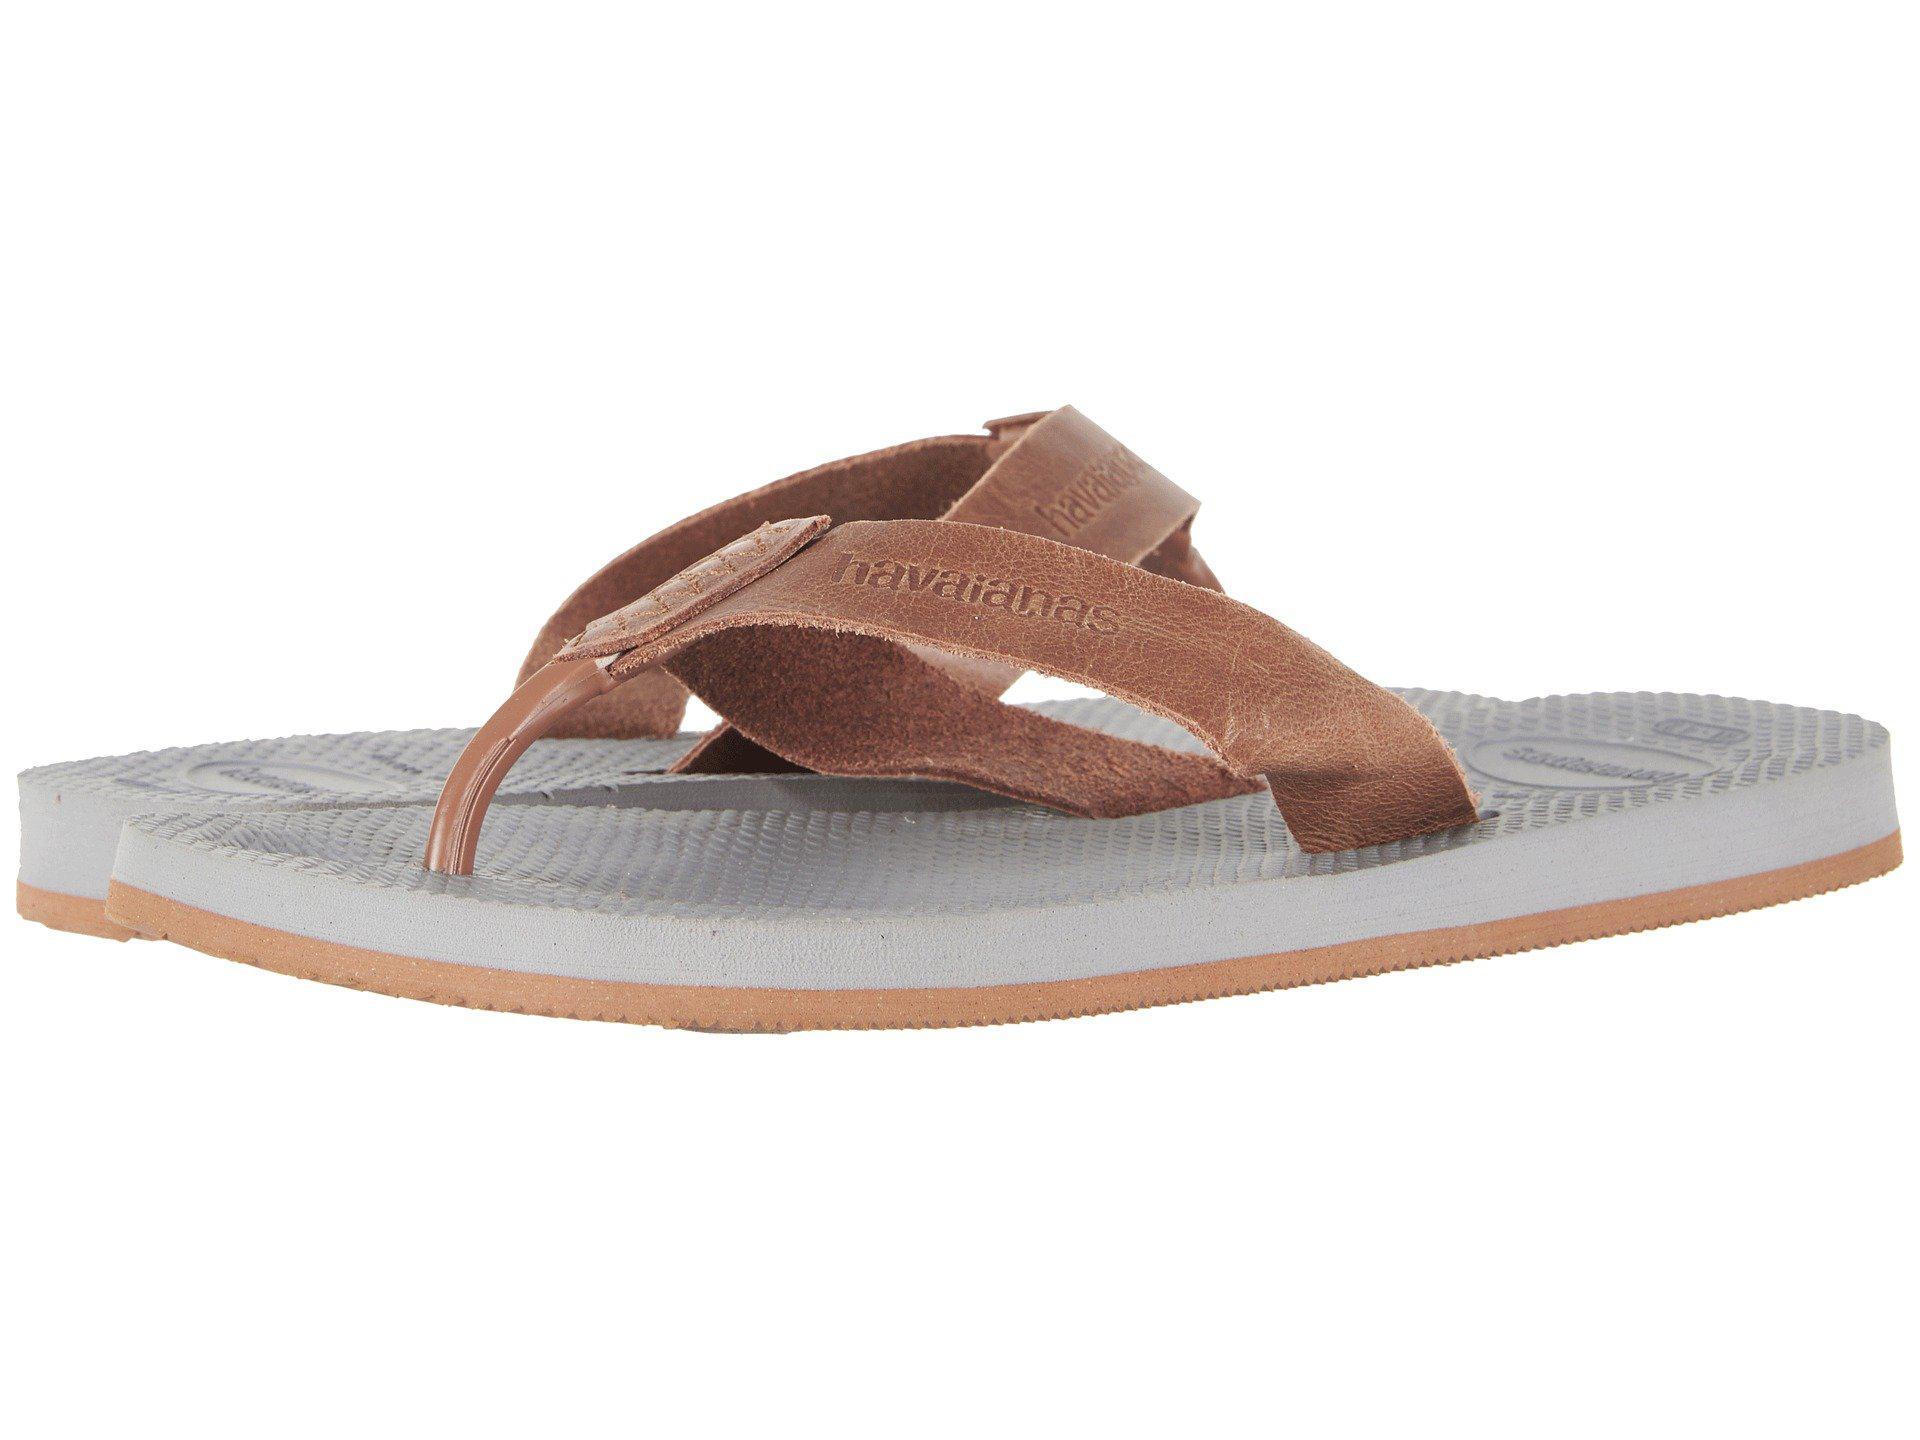 5f50383cb Lyst - Havaianas Urban Special Flip-flops (black) Men s Sandals in ...